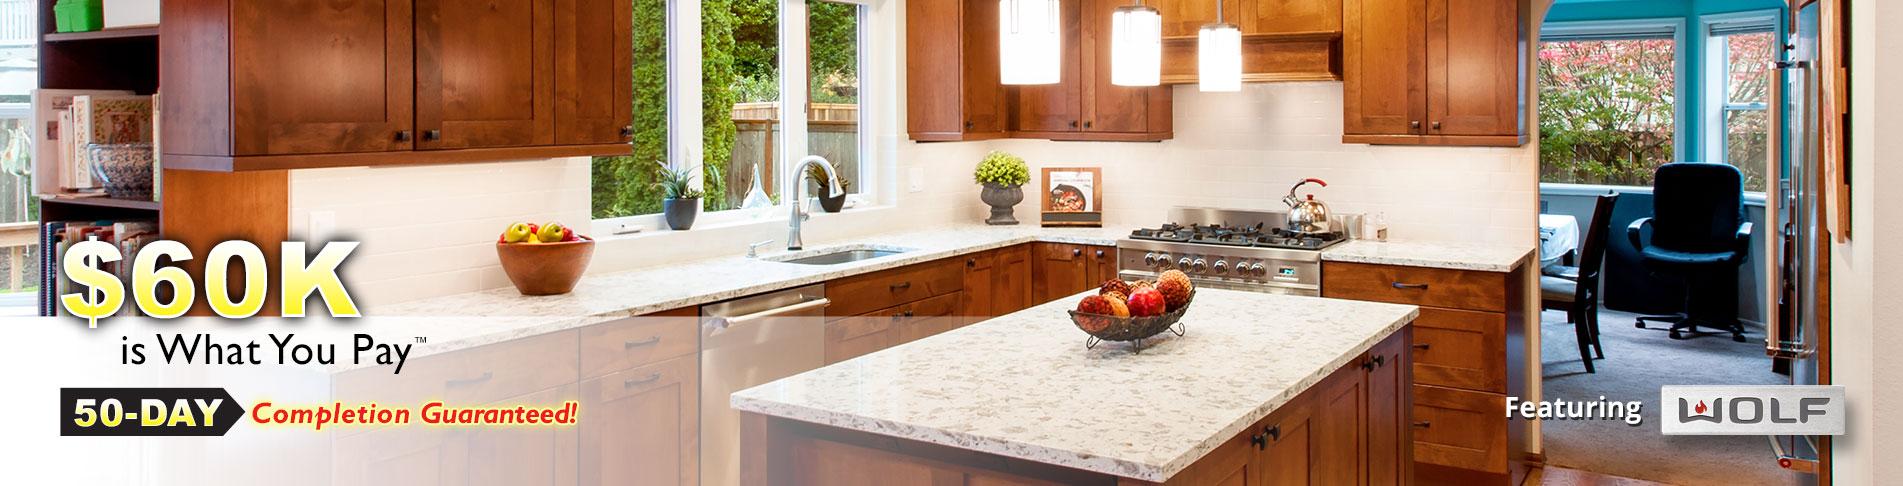 $60K Kitchens